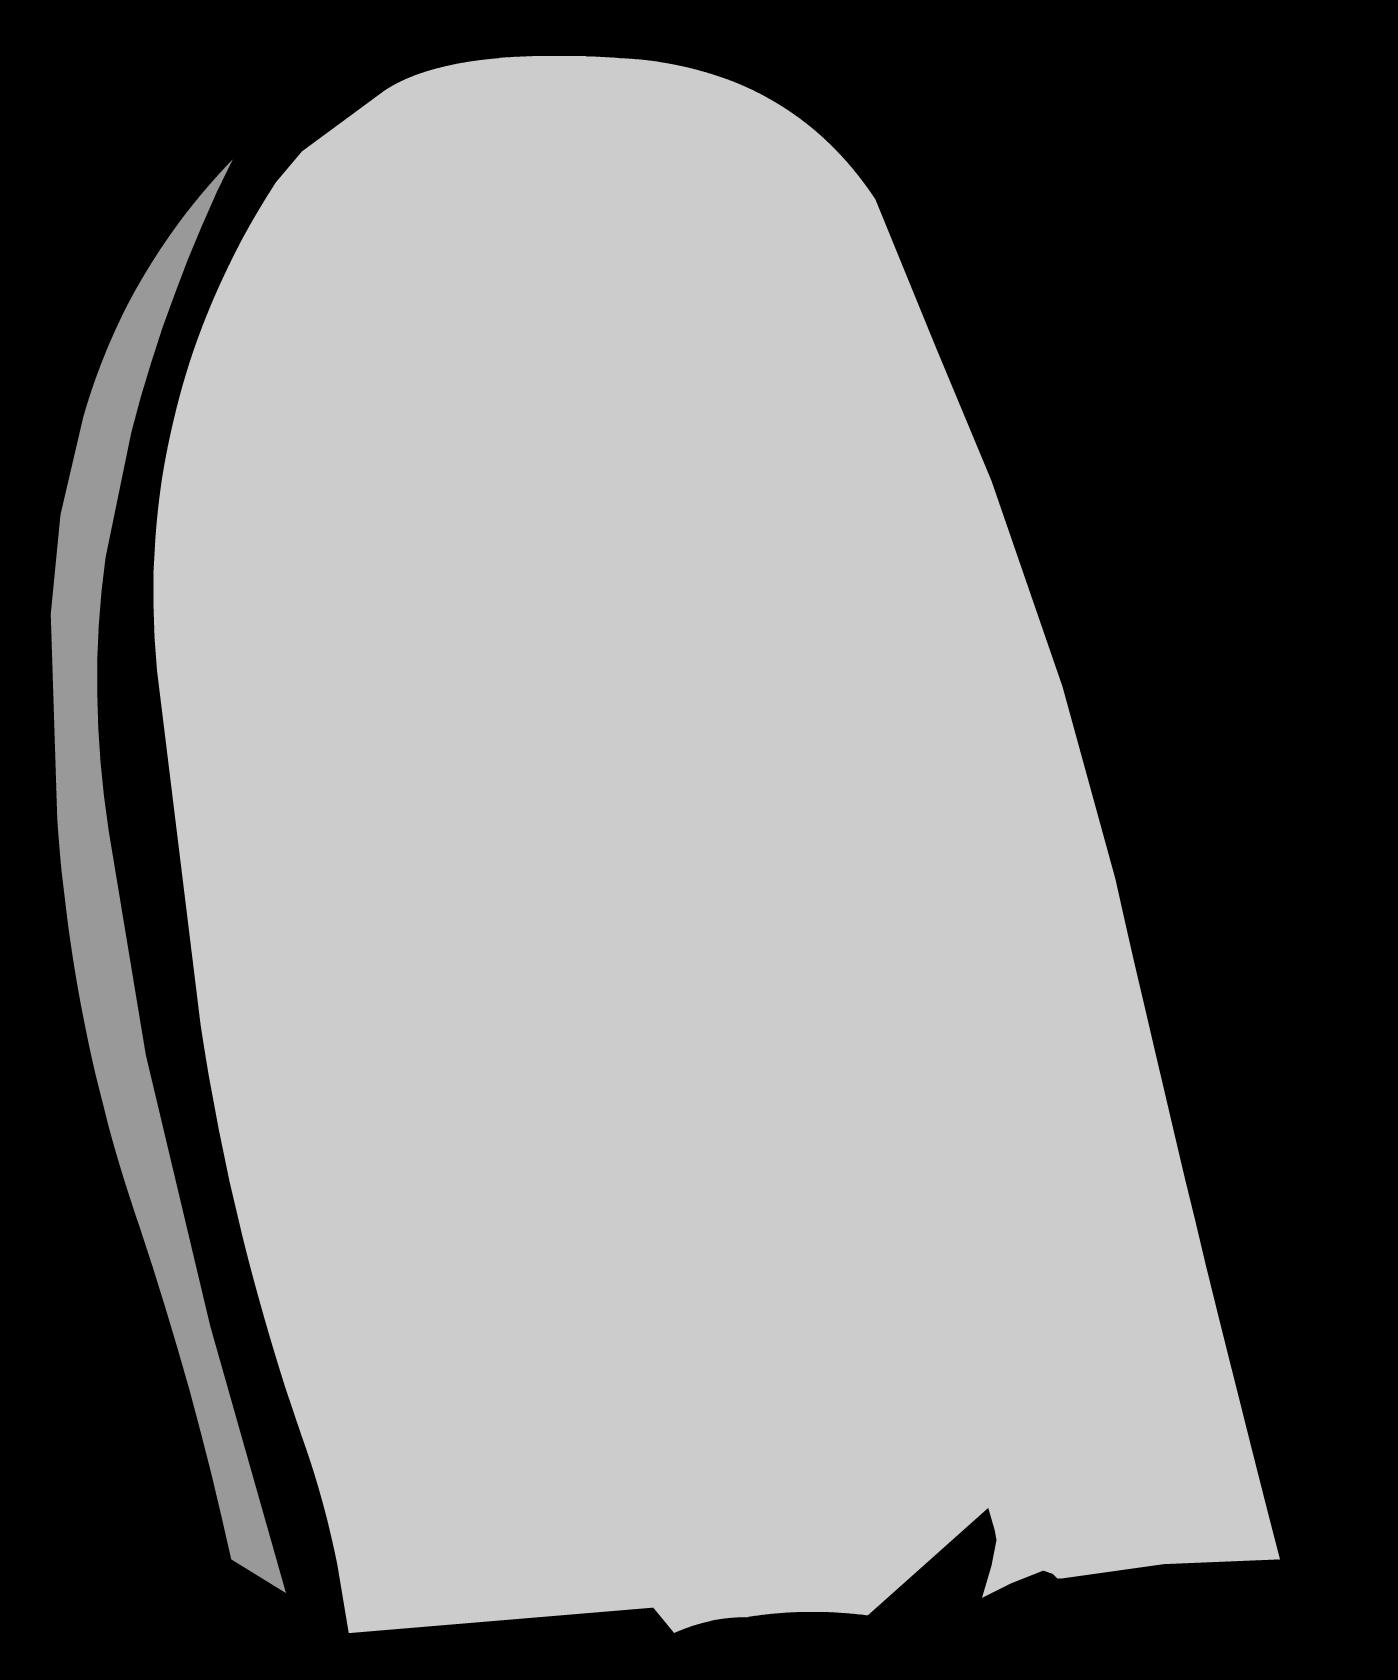 1398x1680 Gravestone Clipart Blank